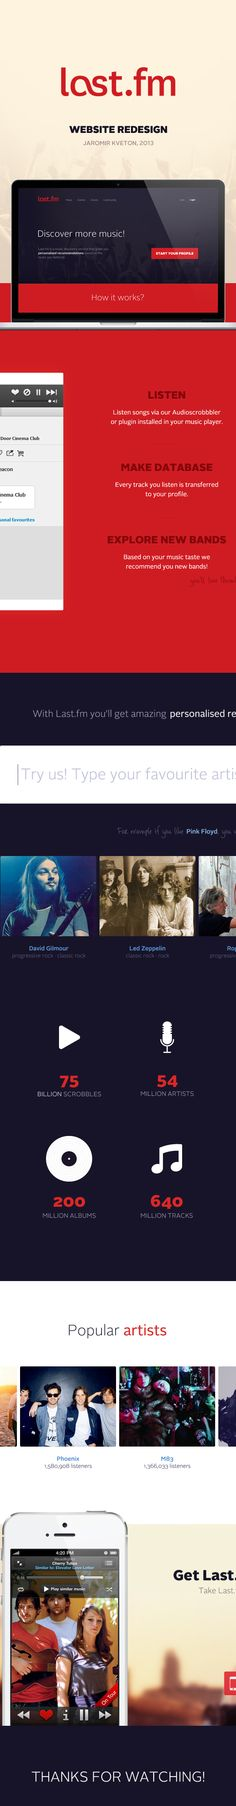 Last.fm redesign by Jaromir Kveton, via Behance